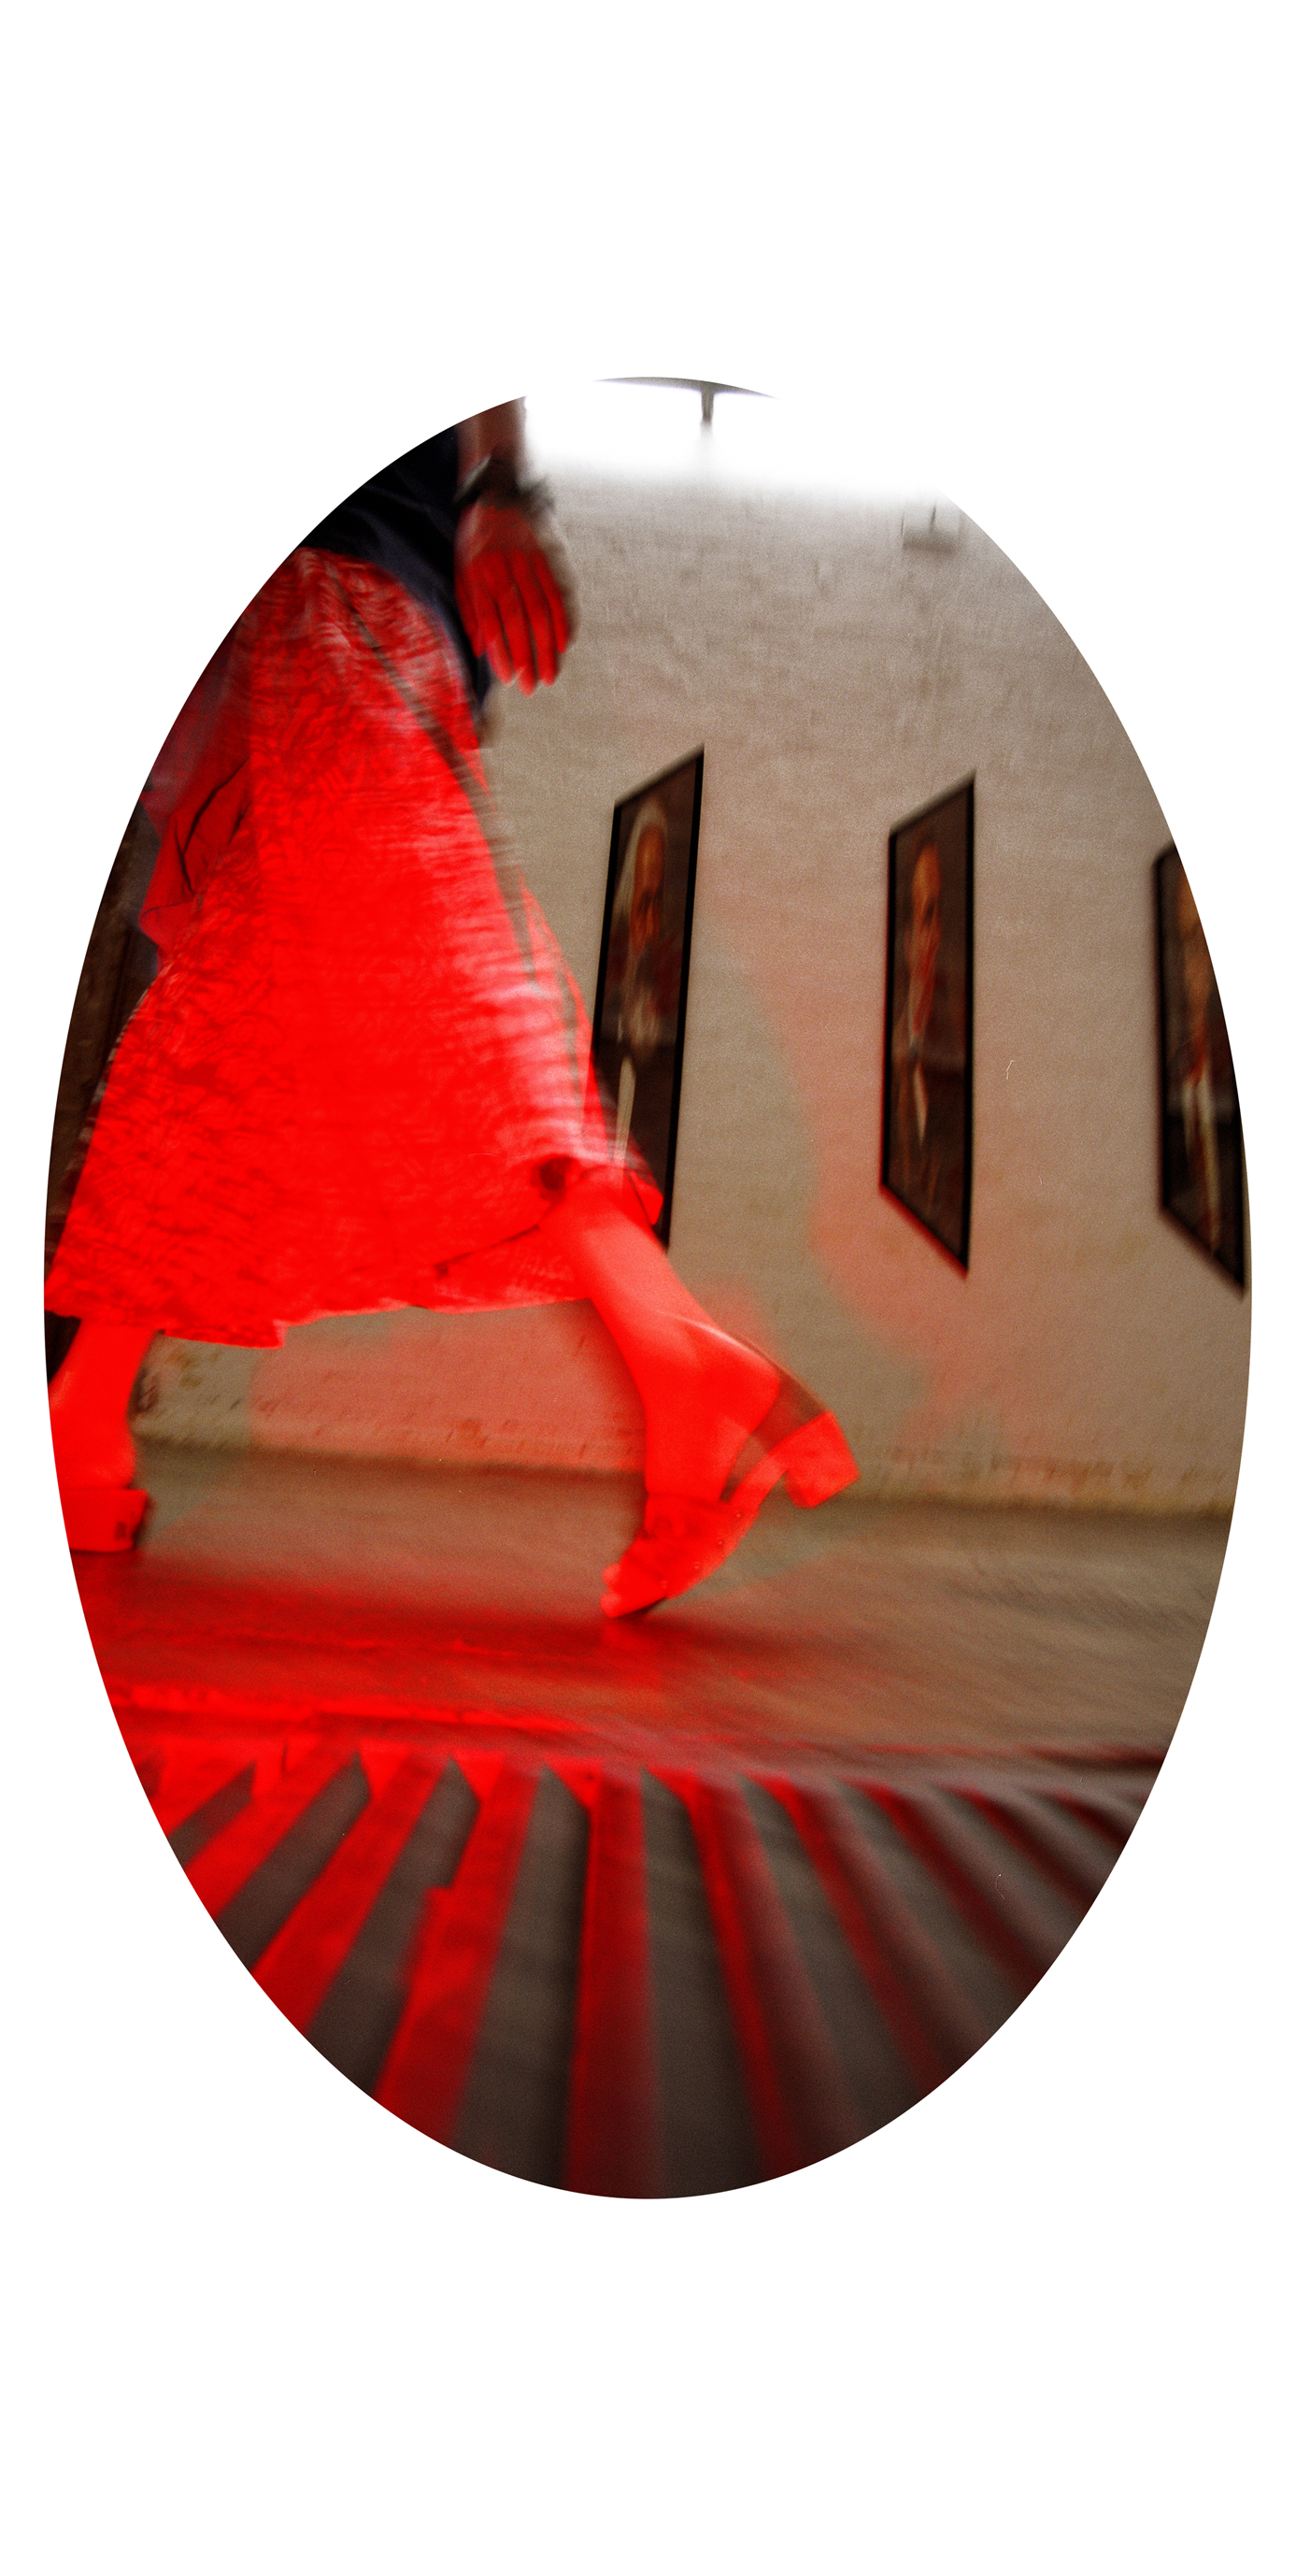 6-the unbearable lightness of Takako dress-Moyi - Dog eye - Chongzi & her red skirt - 09-moyi-photography-of-china.jpg